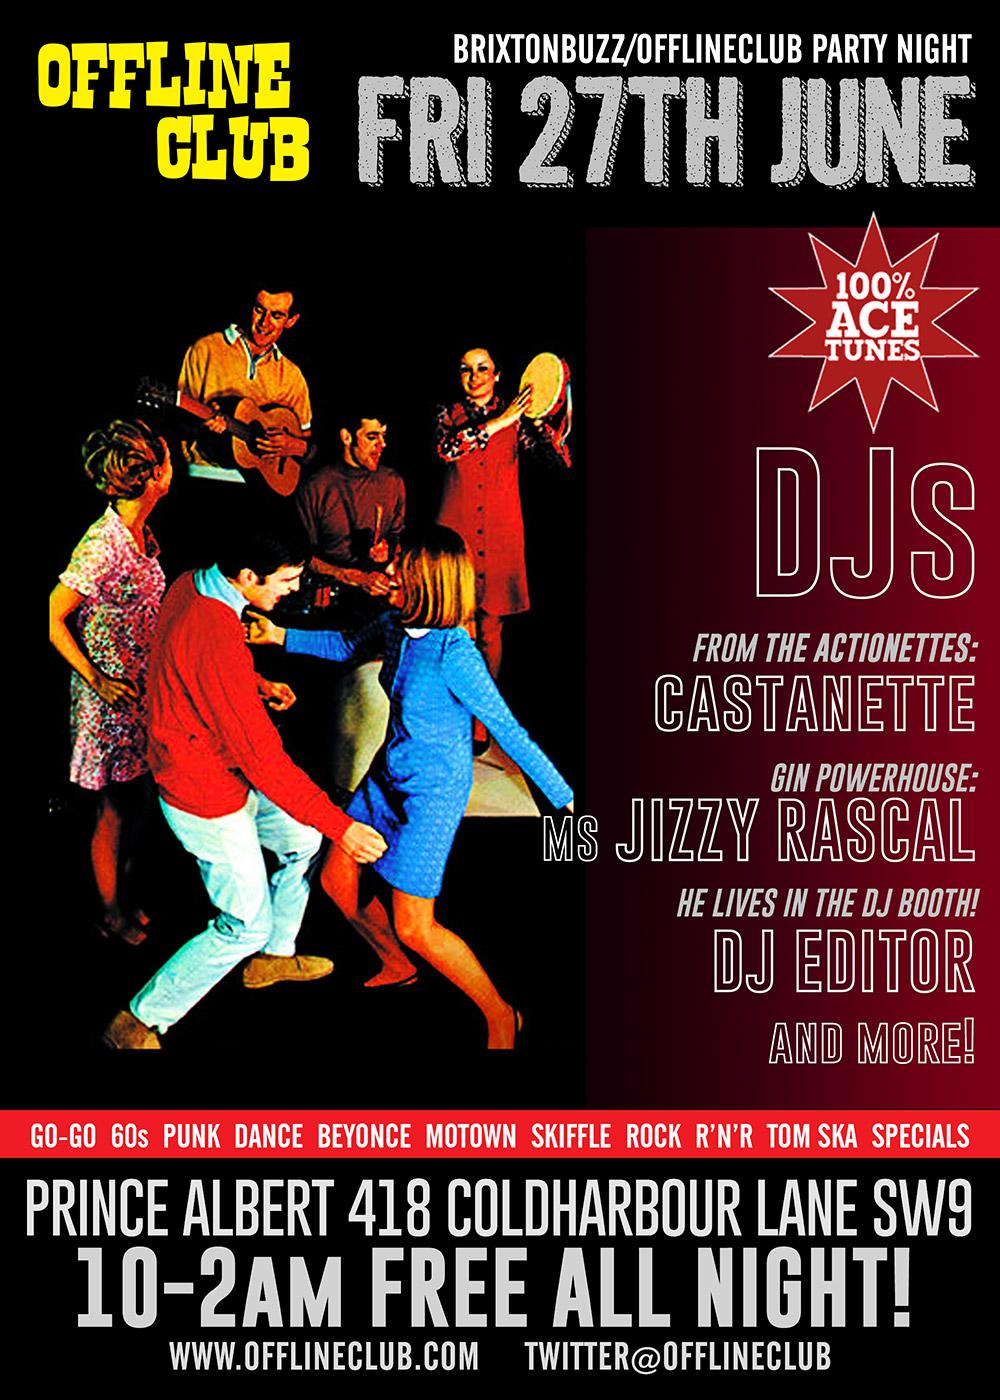 Friday 27th June Dj Night At Offline Club Prince Albert